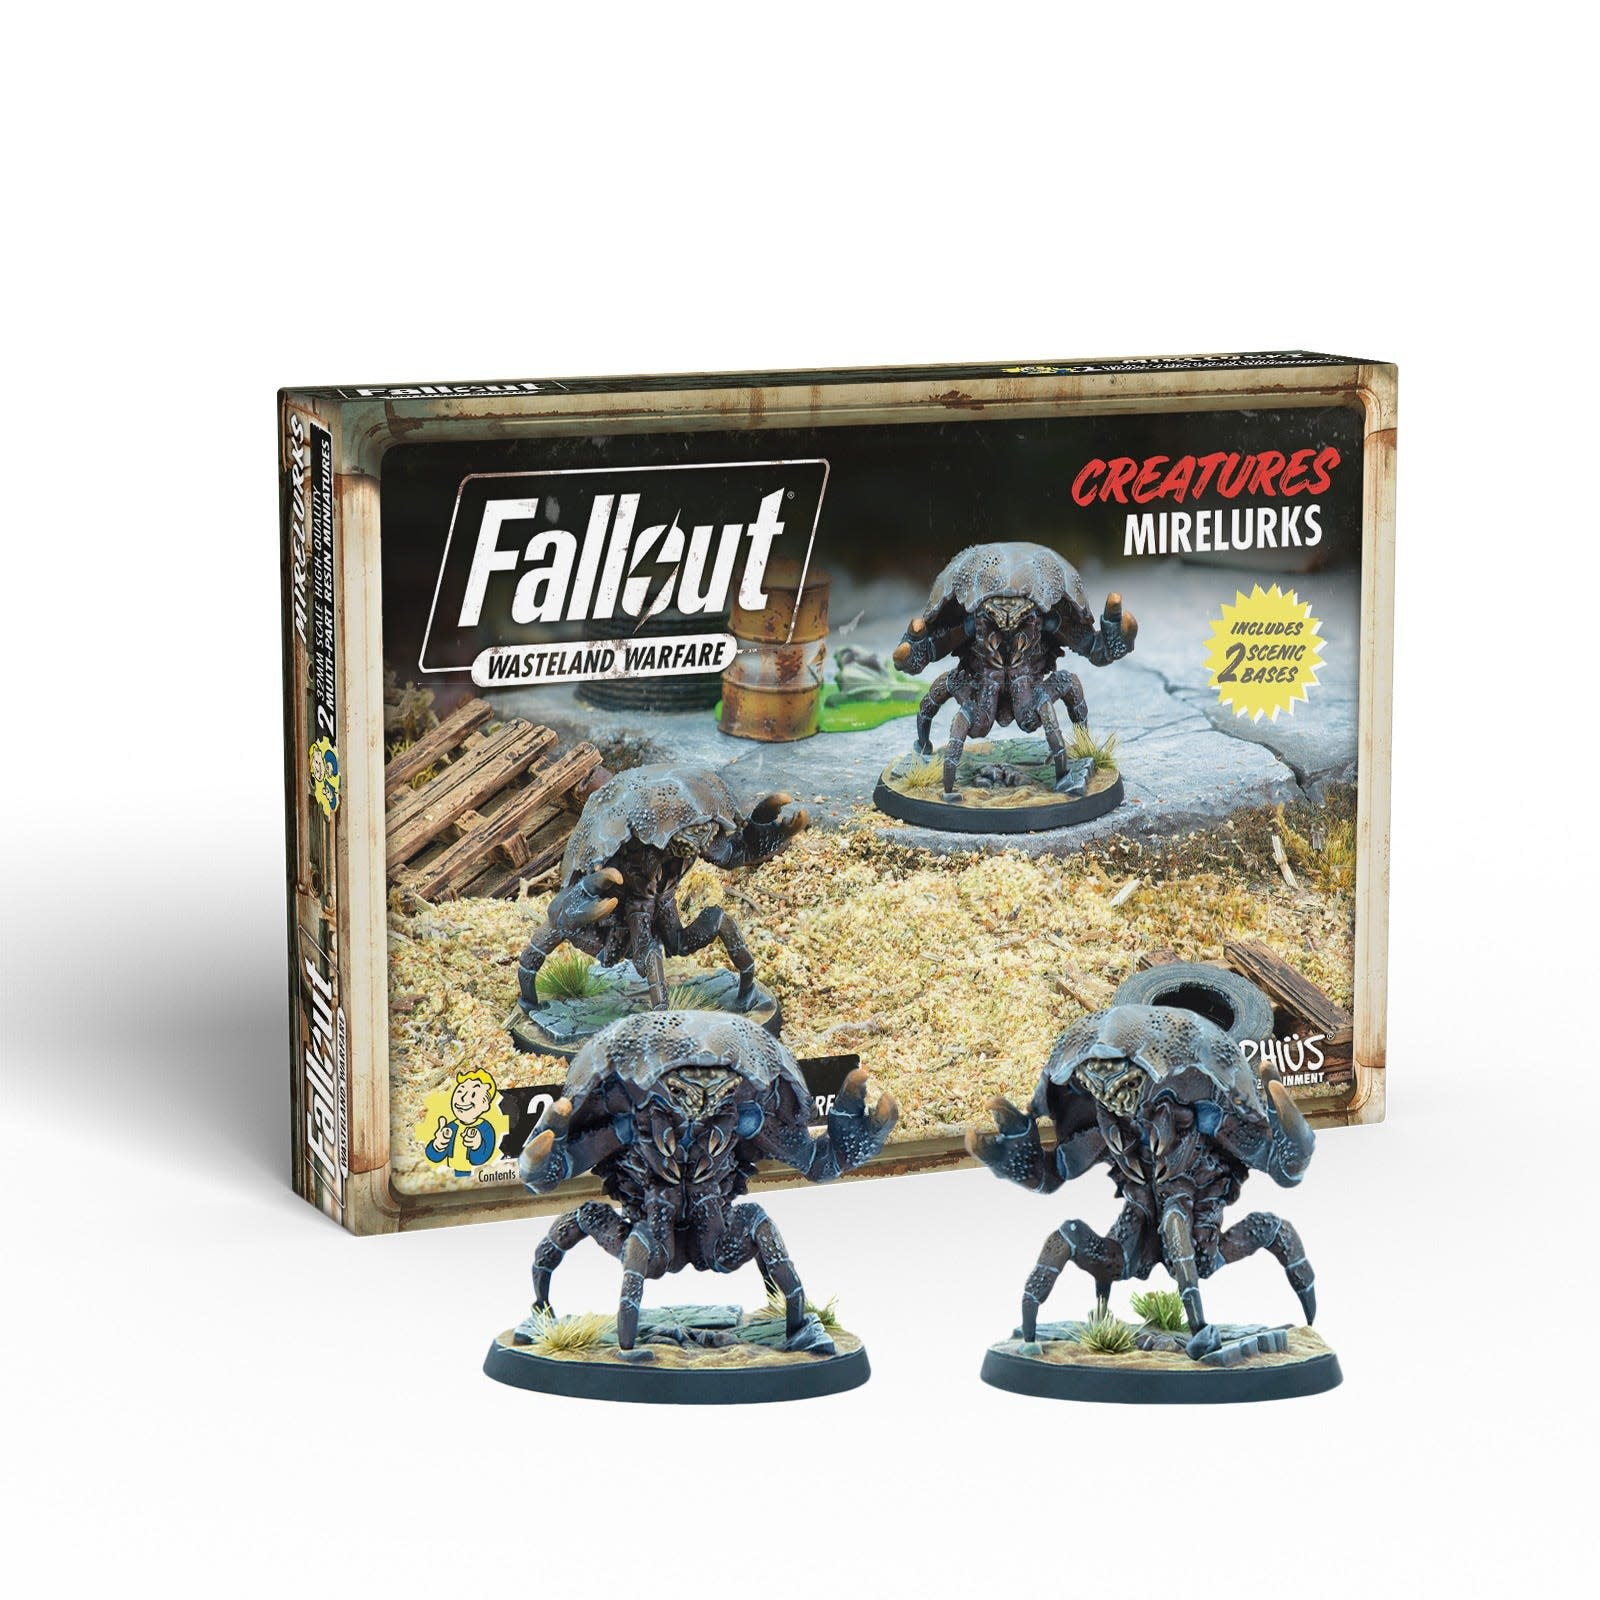 Modiphius Fallout Wasteland Warfare: Creatures- Mirelurks